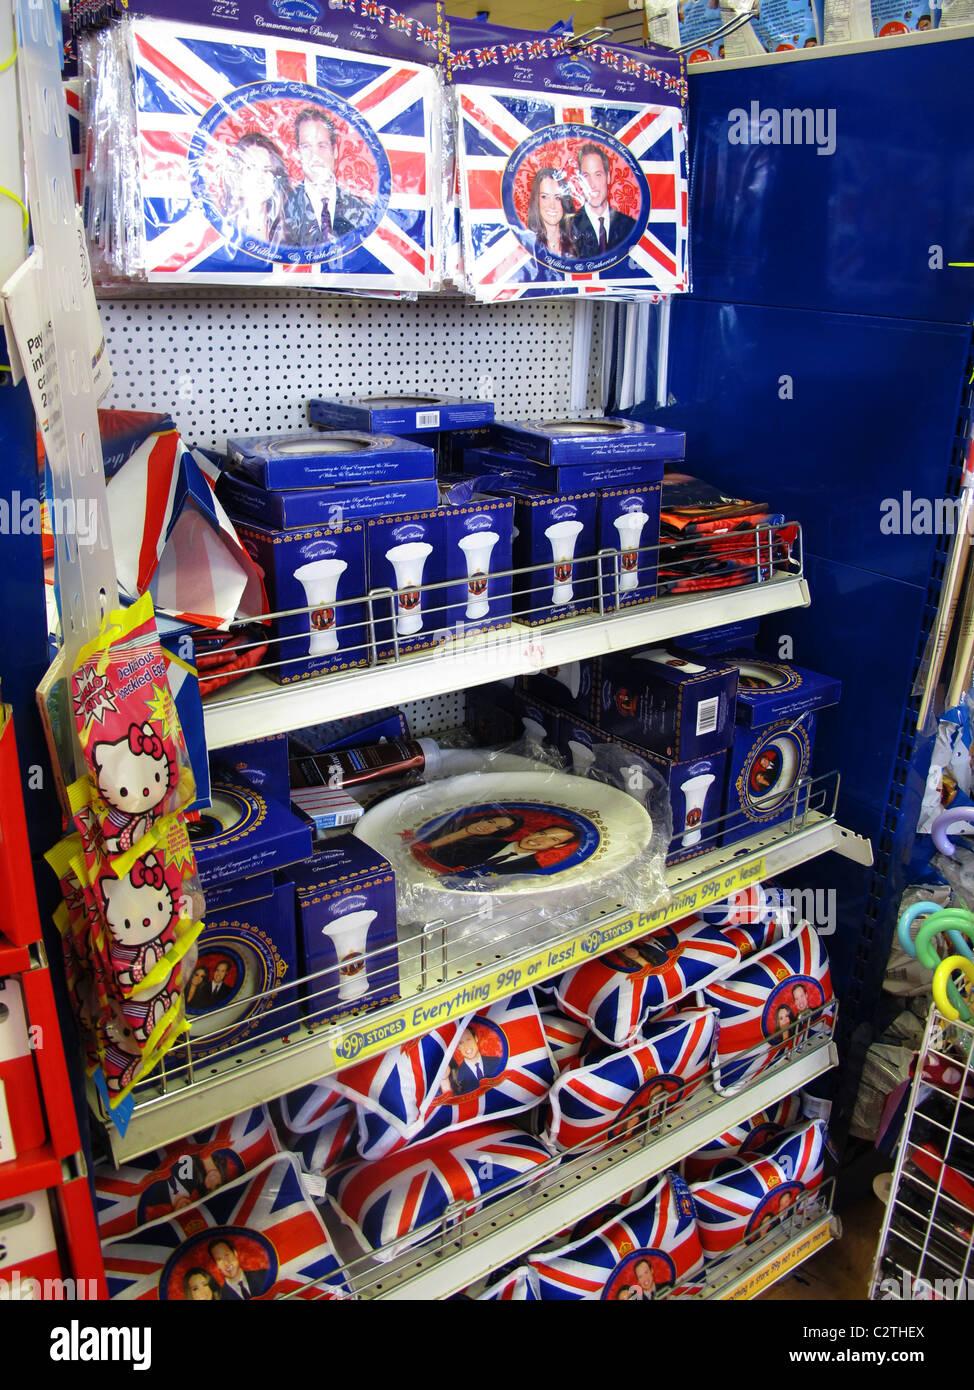 Tacky Royal wedding souvenir stand - Stock Image